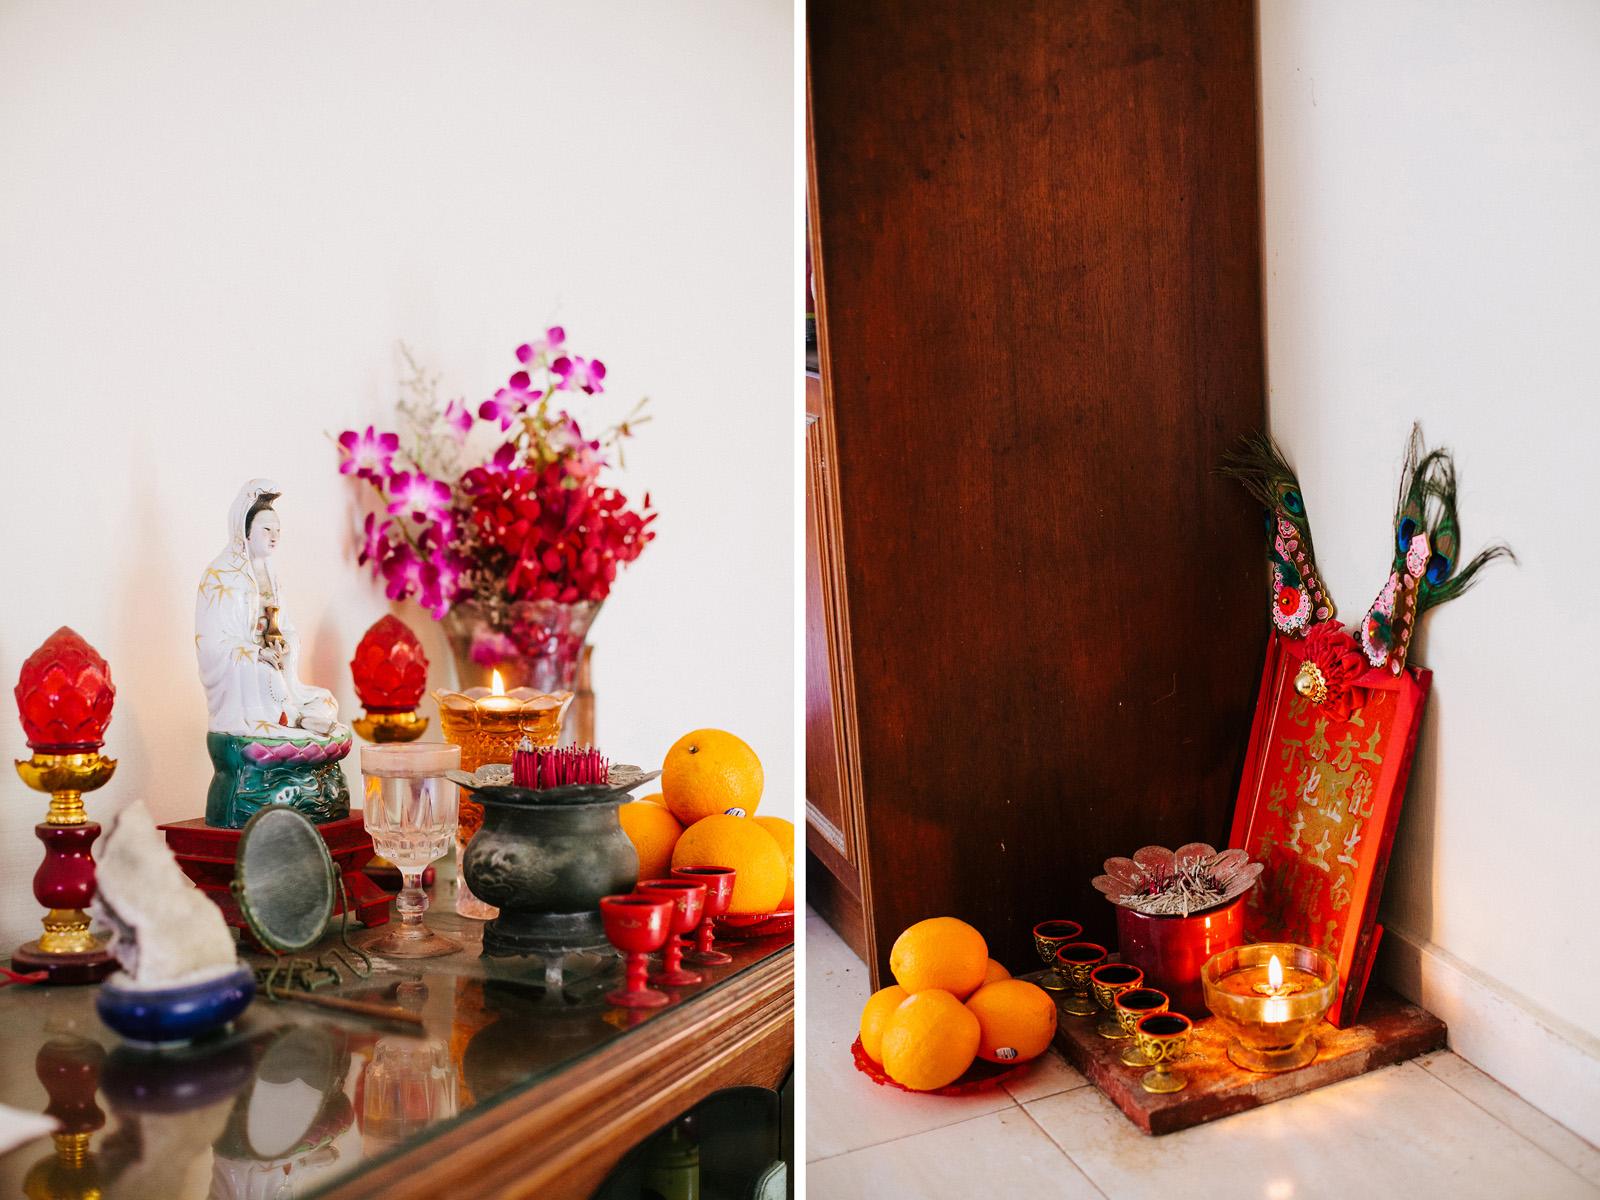 singapore-wedding-travel-photographer-faith-alvin-wedding-wmt-15.jpg